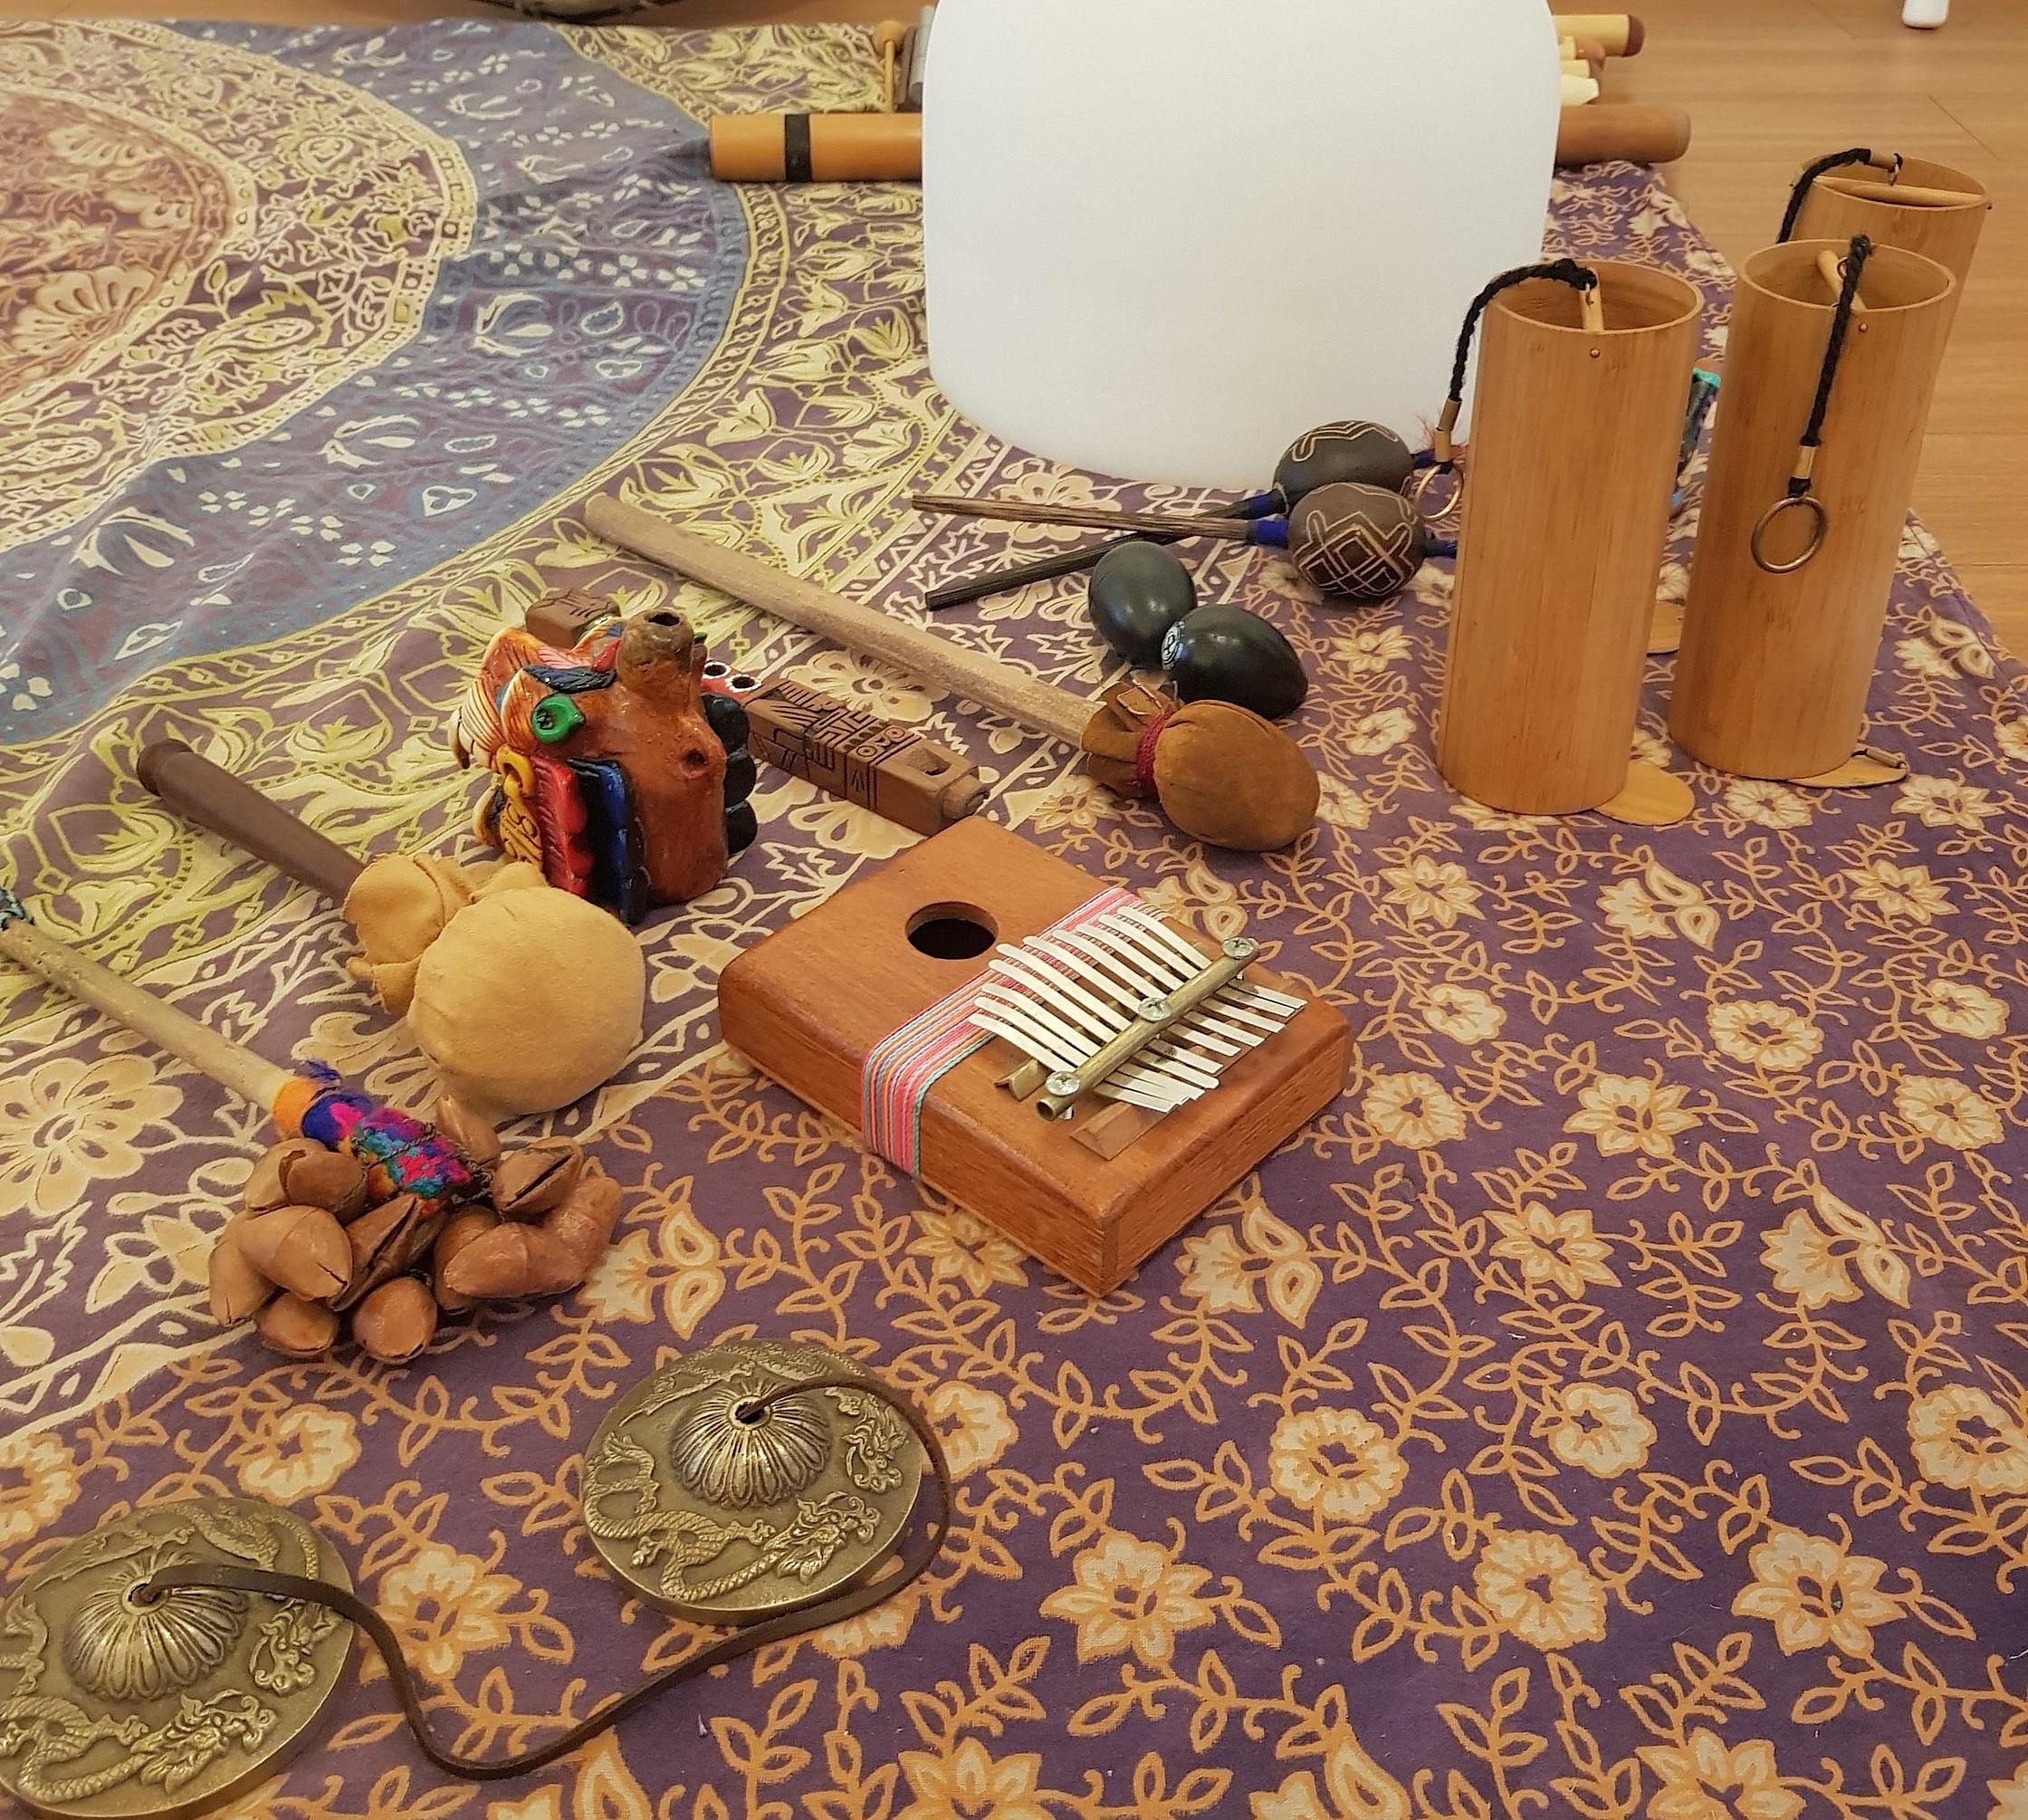 instrumentos musicales yoga infantil sonotera